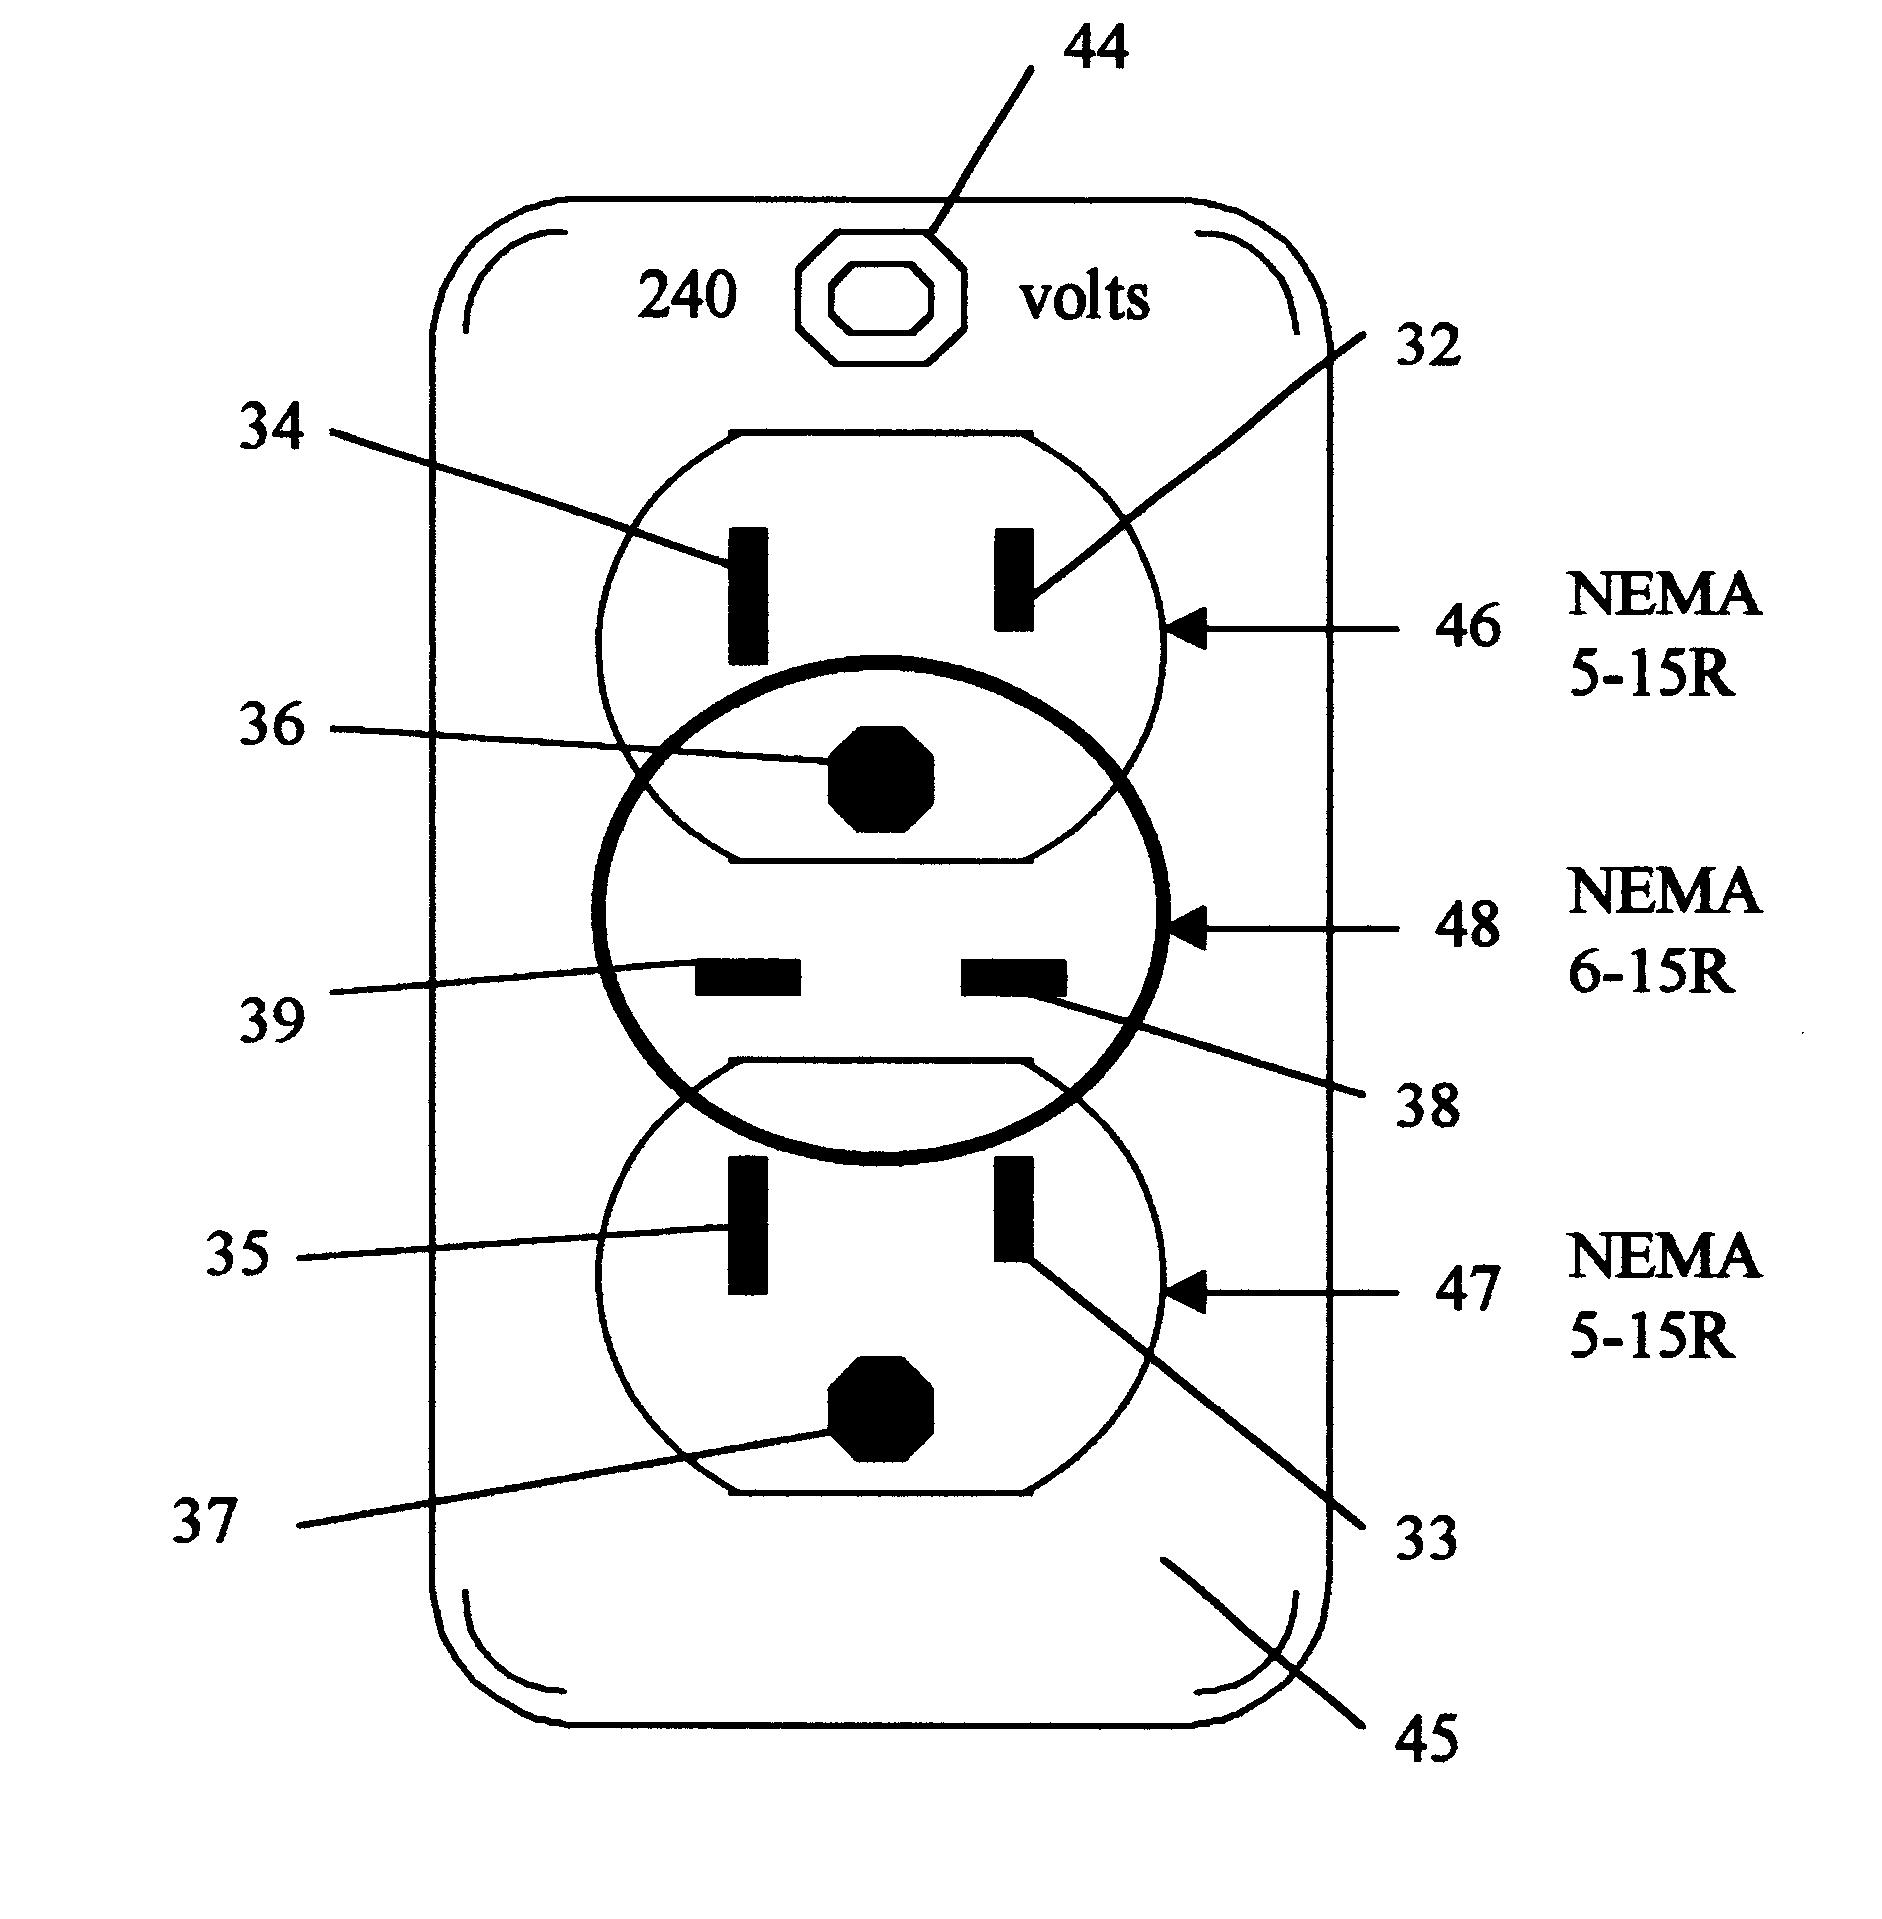 Us6328584 us0632858420011211d00000 split receptacle wiring diagram at w justdeskto allpapers